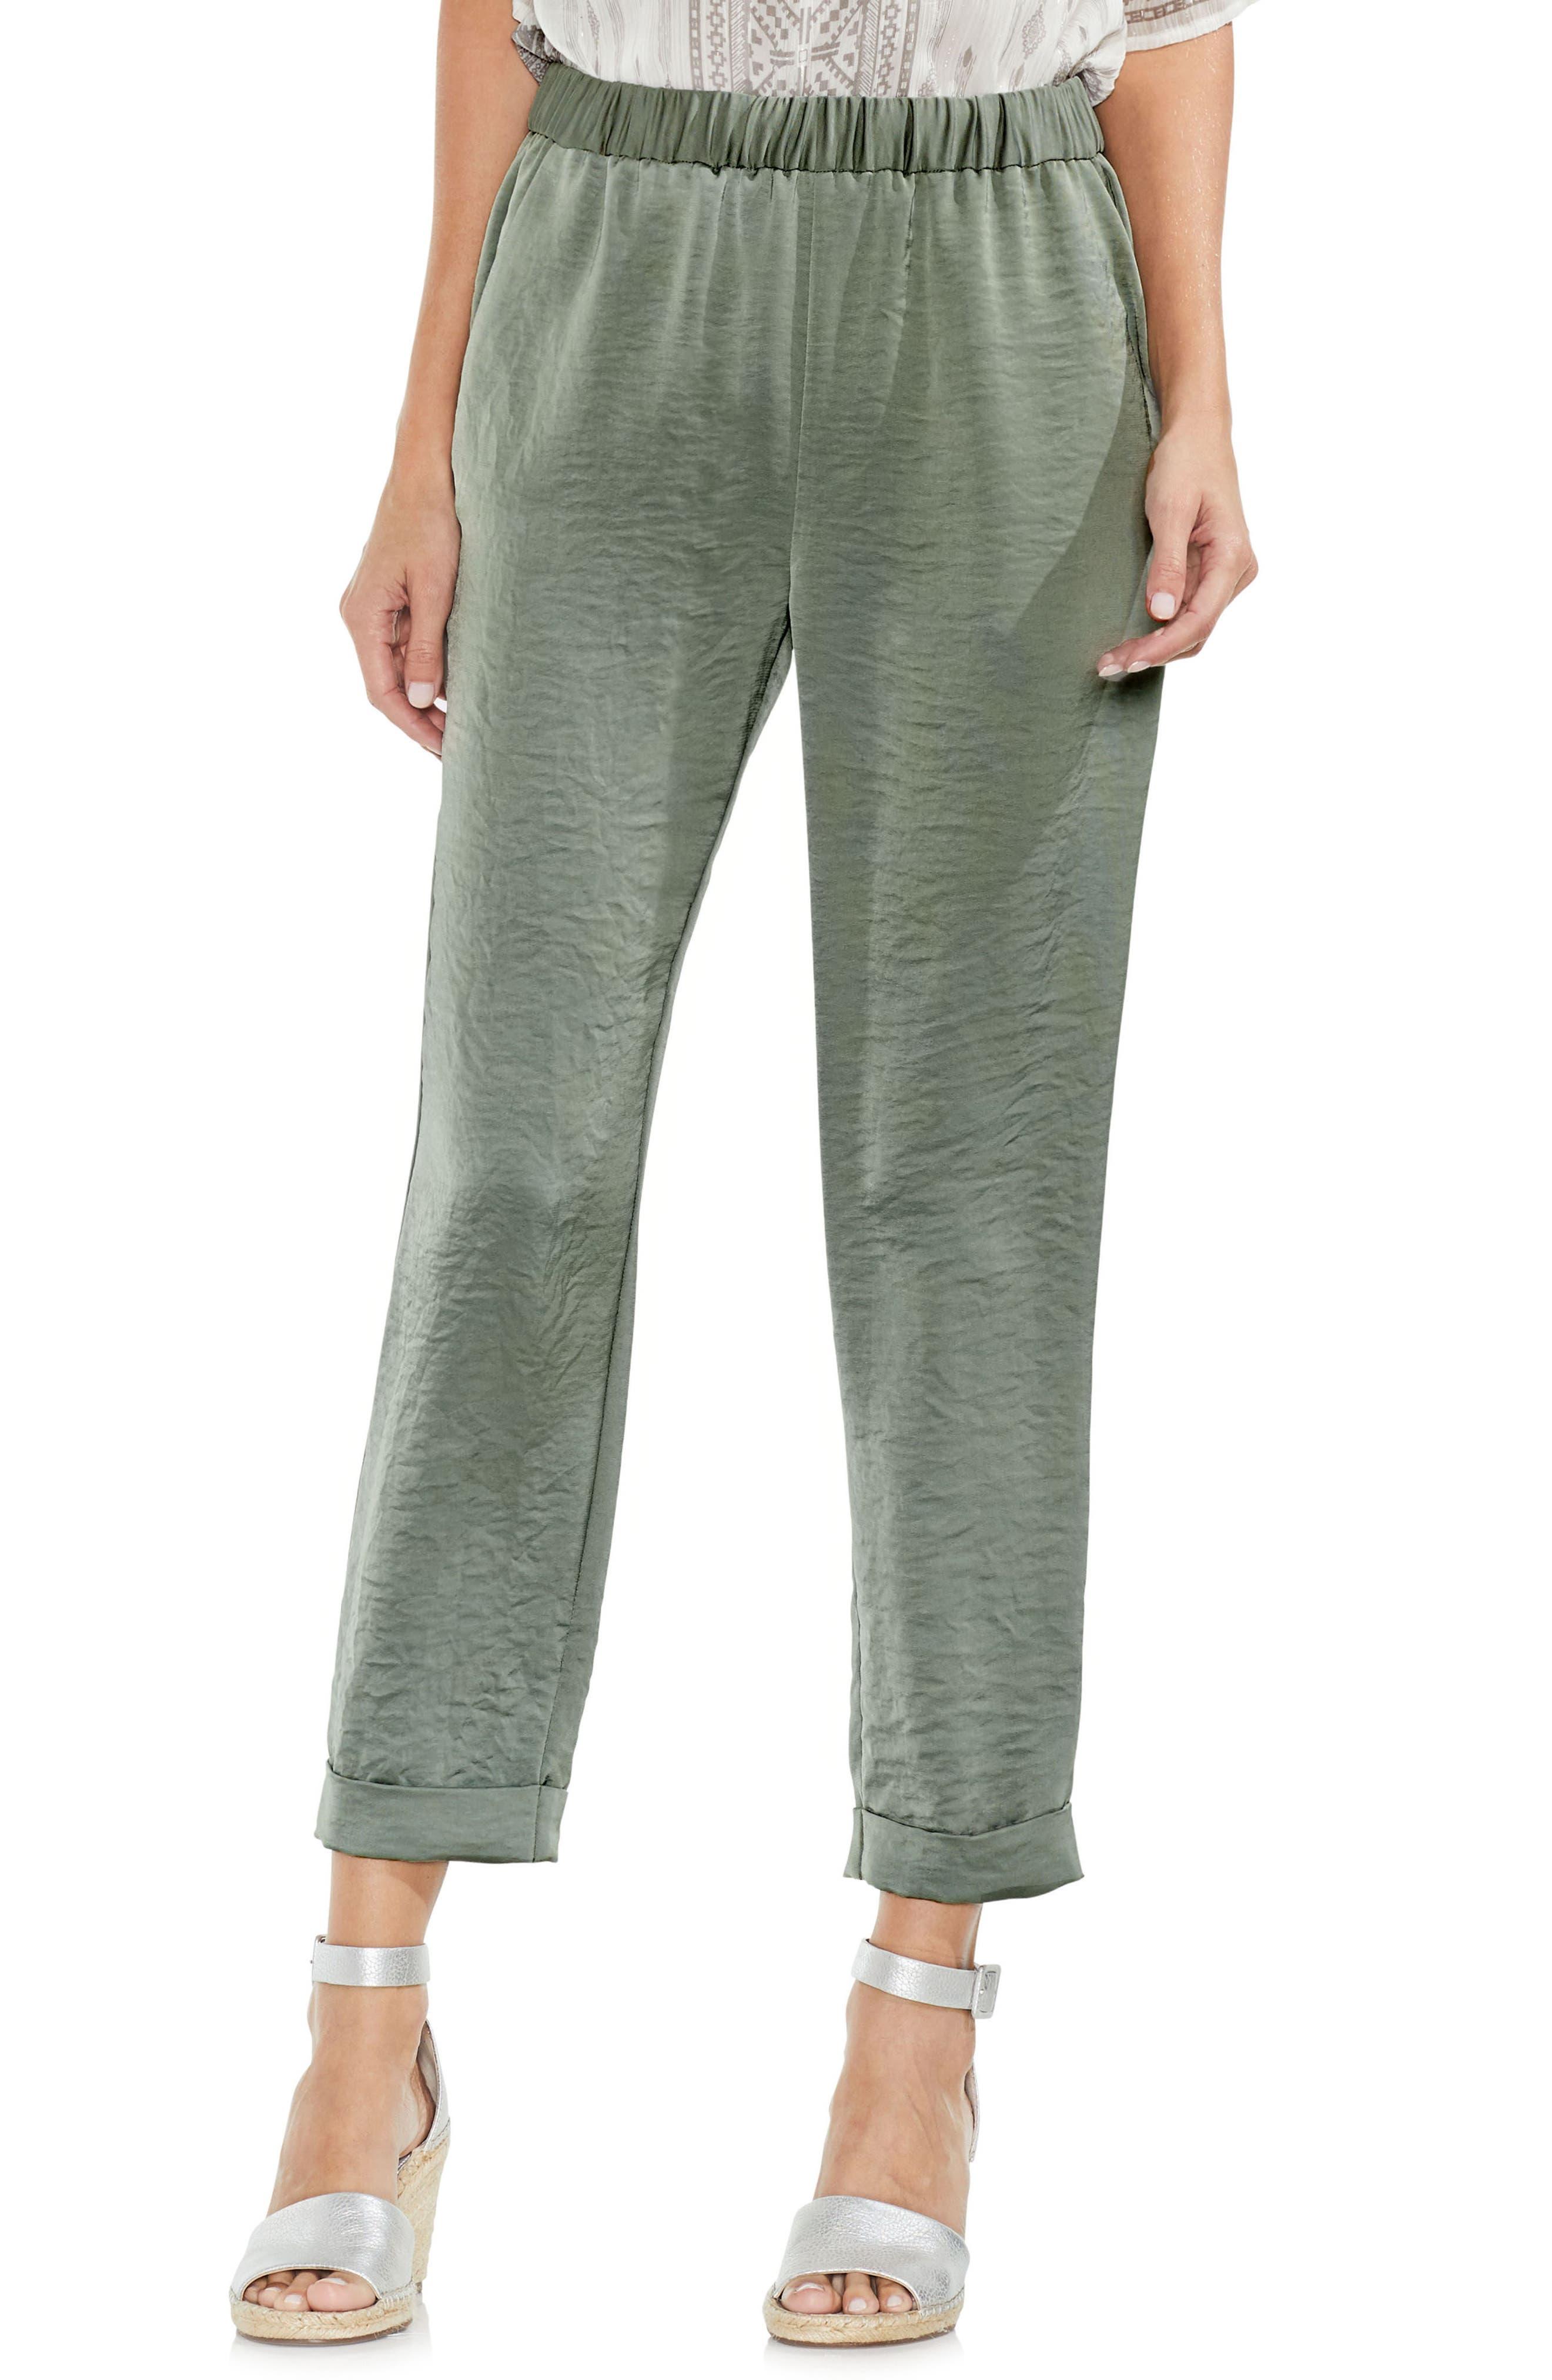 Hammered Satin Crop Jogger Pants,                         Main,                         color, Camo Green